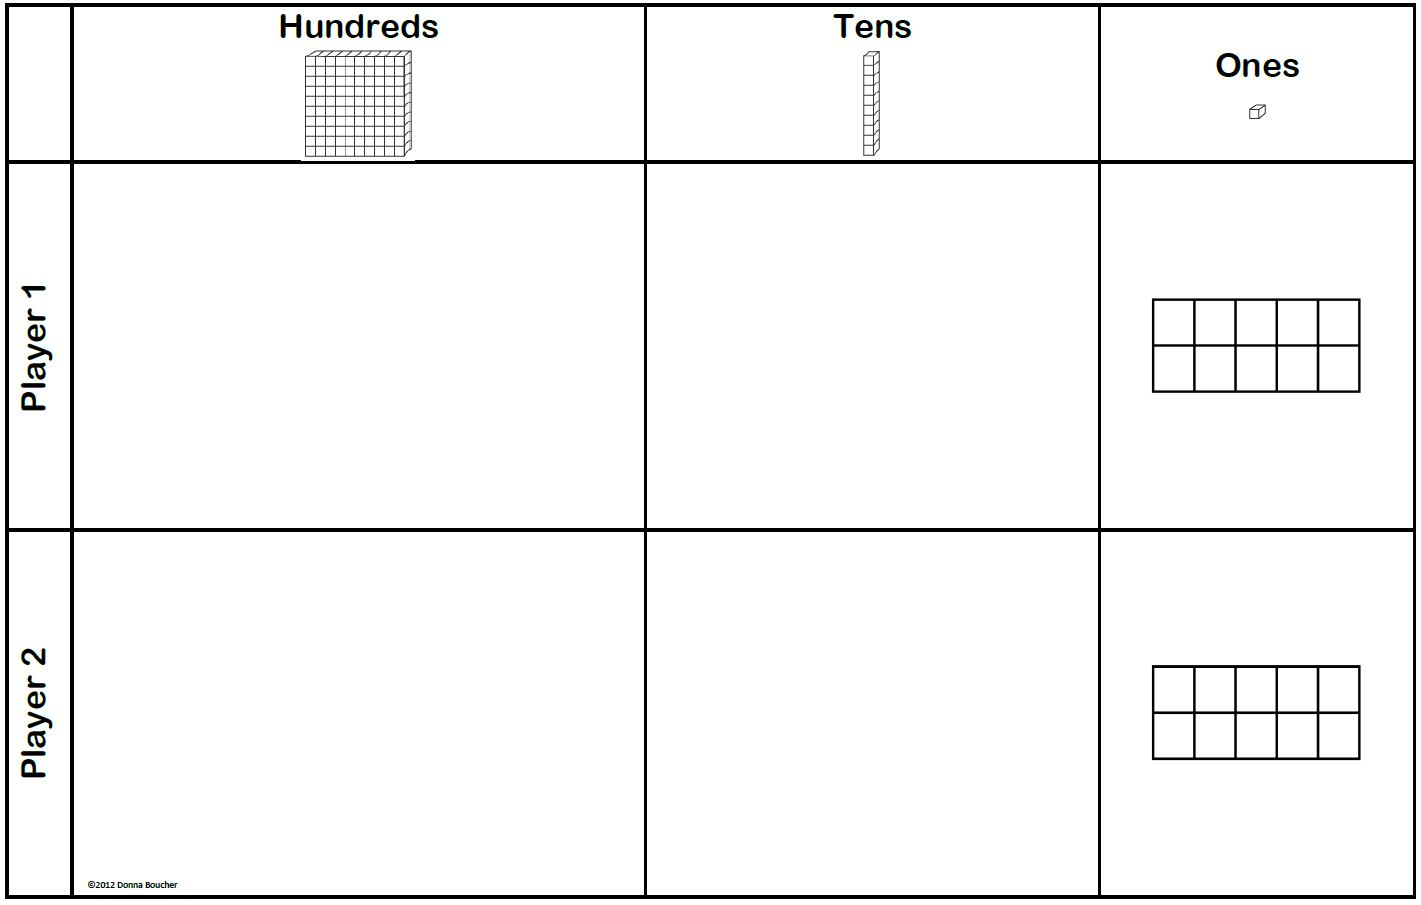 Ones Tens Hundreds Blocks Worksheet   Printable Worksheets and Activities  for Teachers [ 905 x 1421 Pixel ]